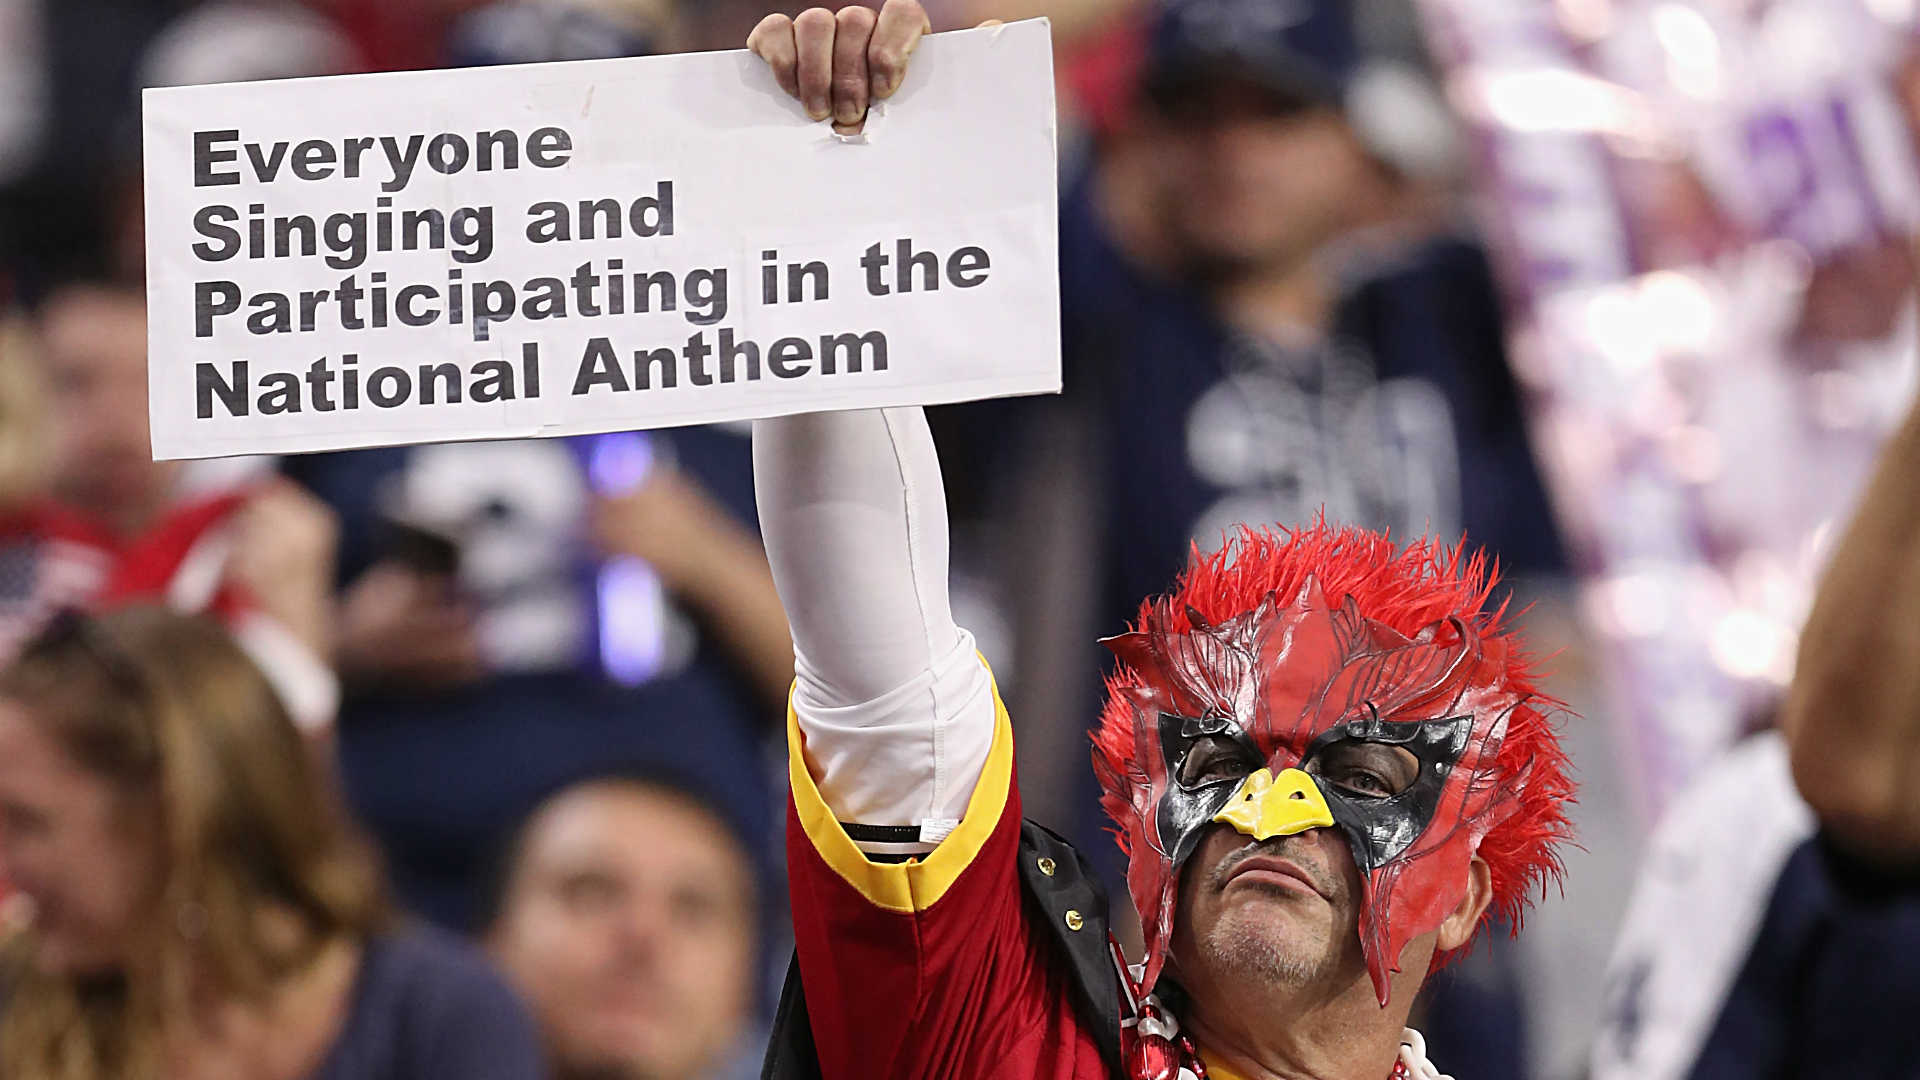 Cardinals-anthem-092617-Getty-FTR